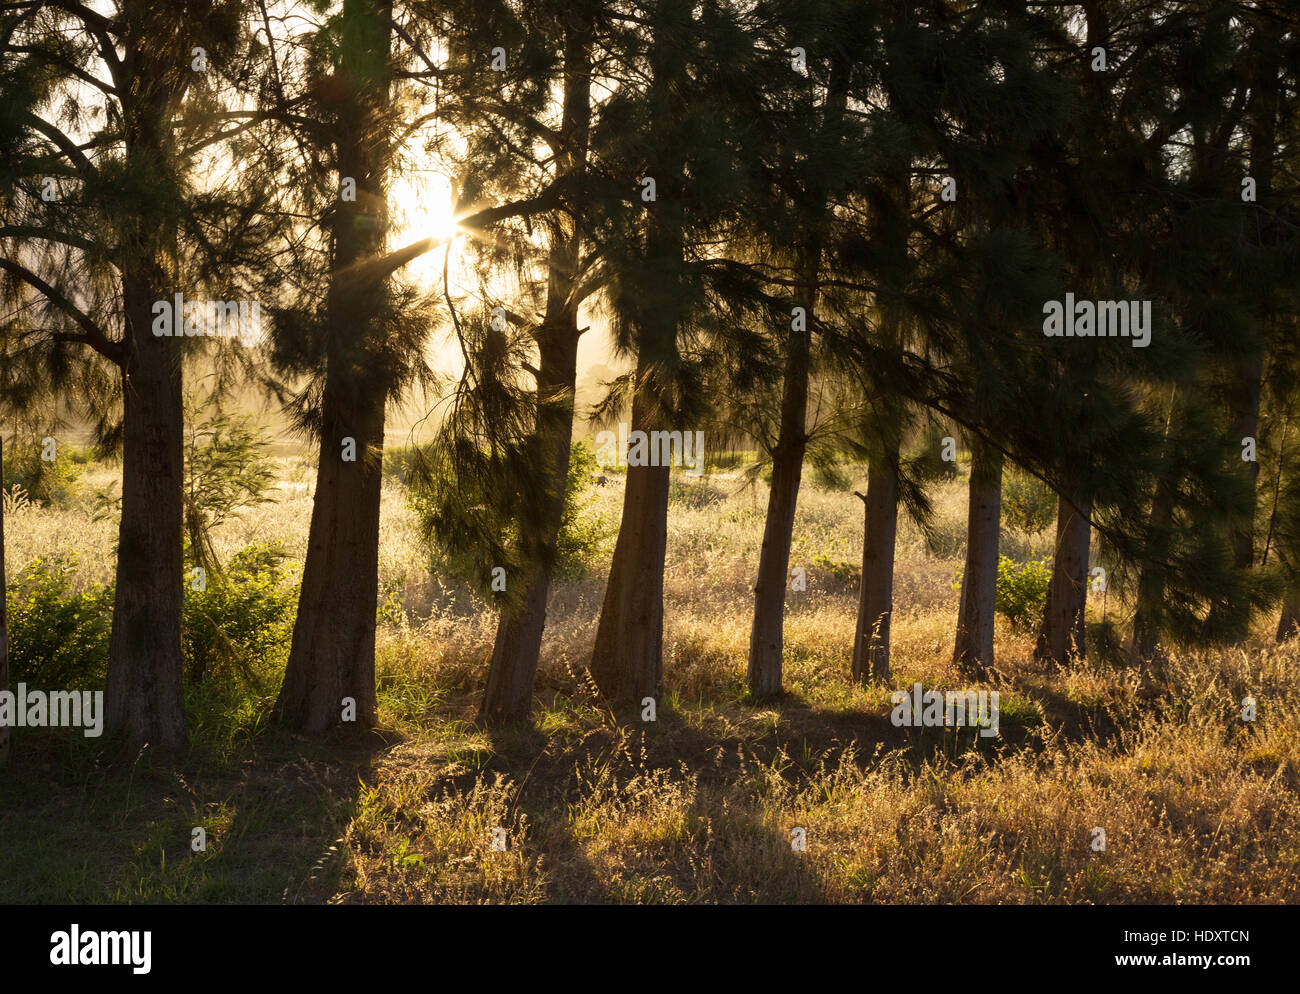 Morning sunlight shining through pine trees, South Africa - Stock Image